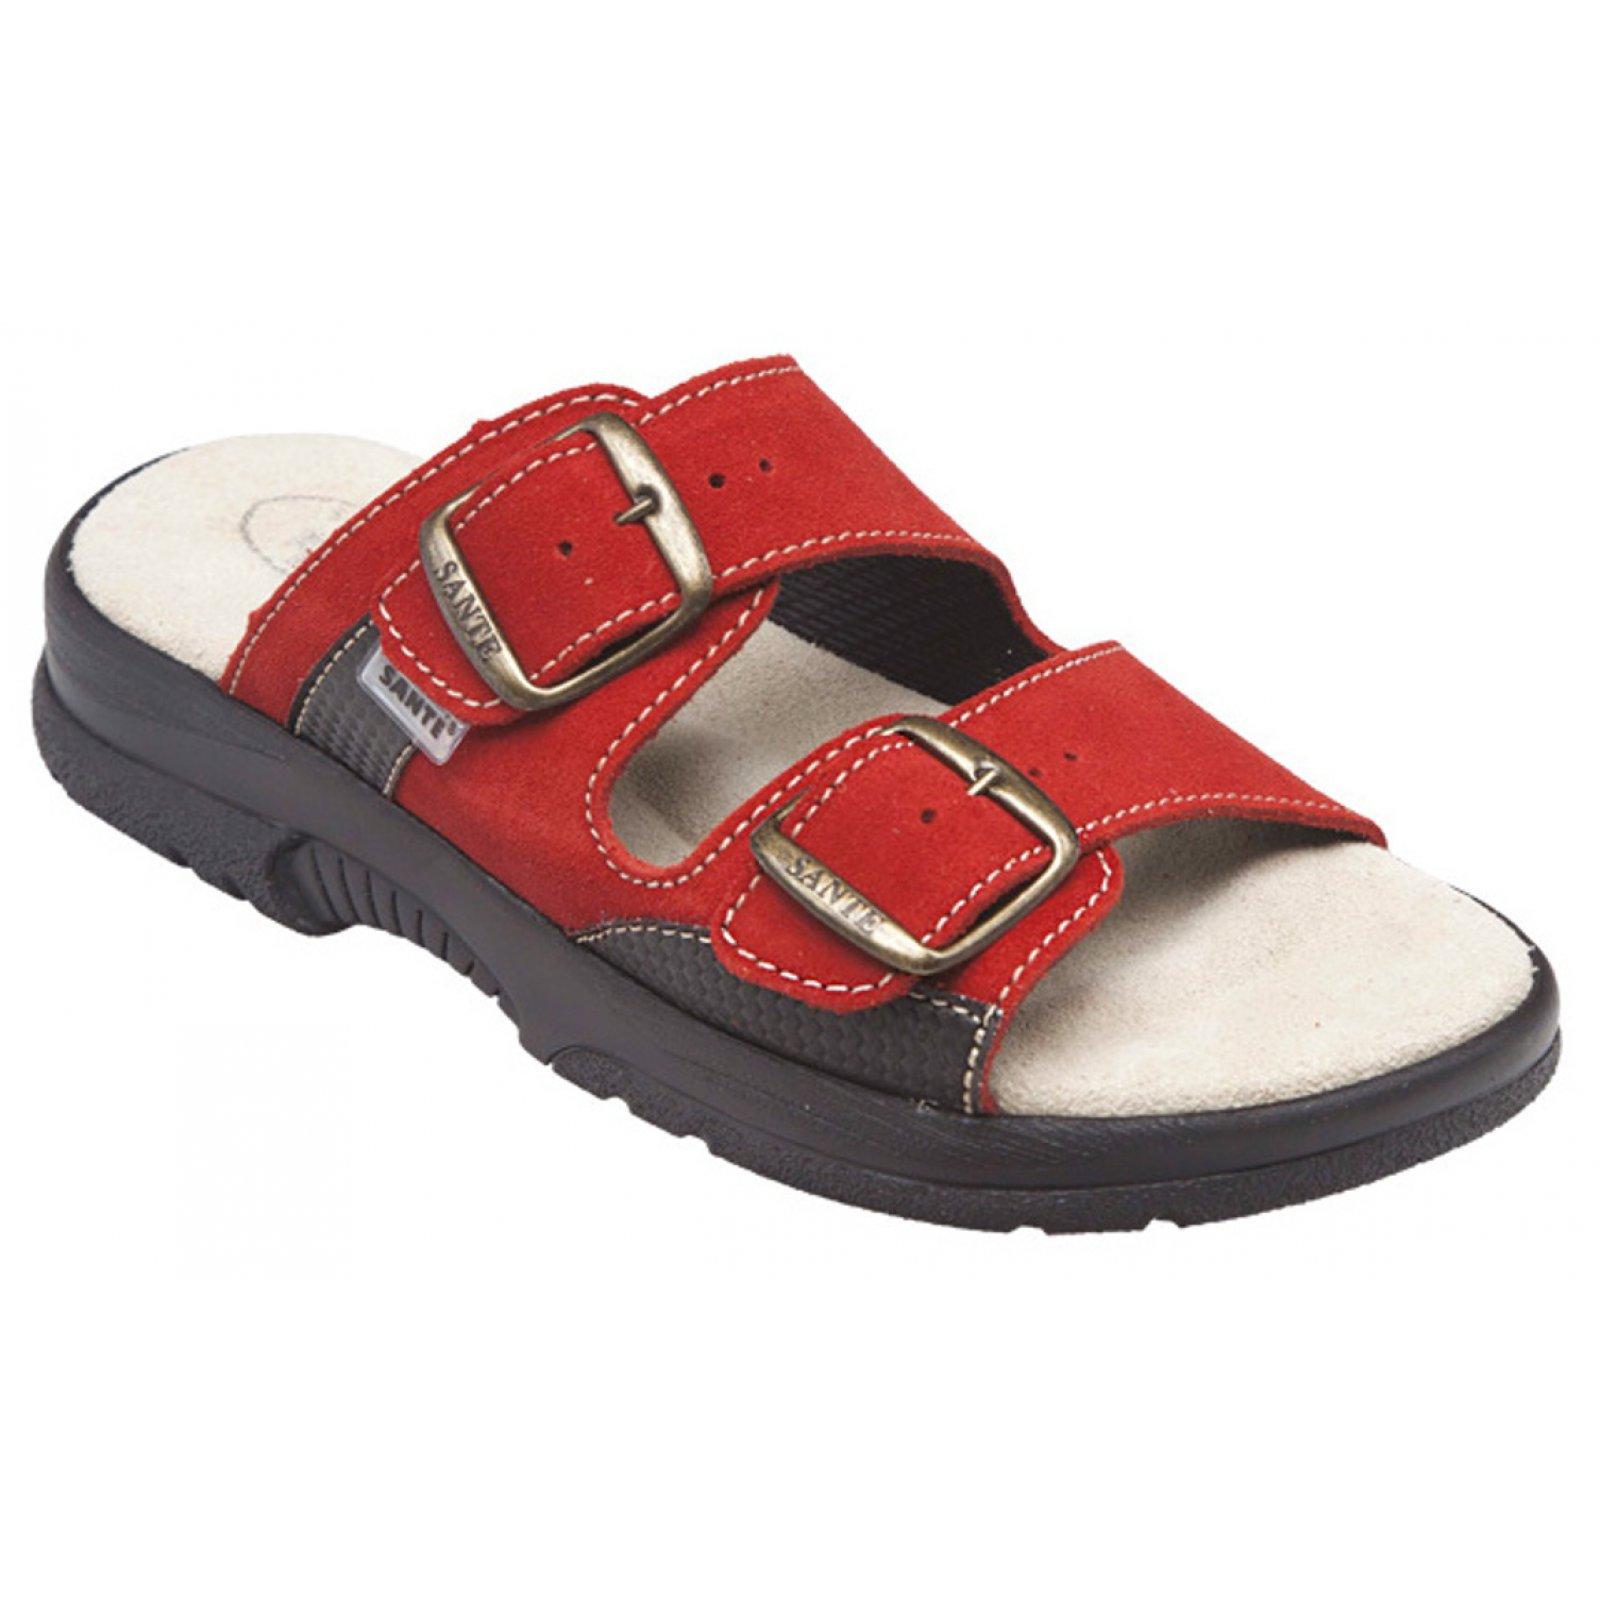 dámské pantofle Santé 517 33 38 červené CP - KARS 10aae7d5b3